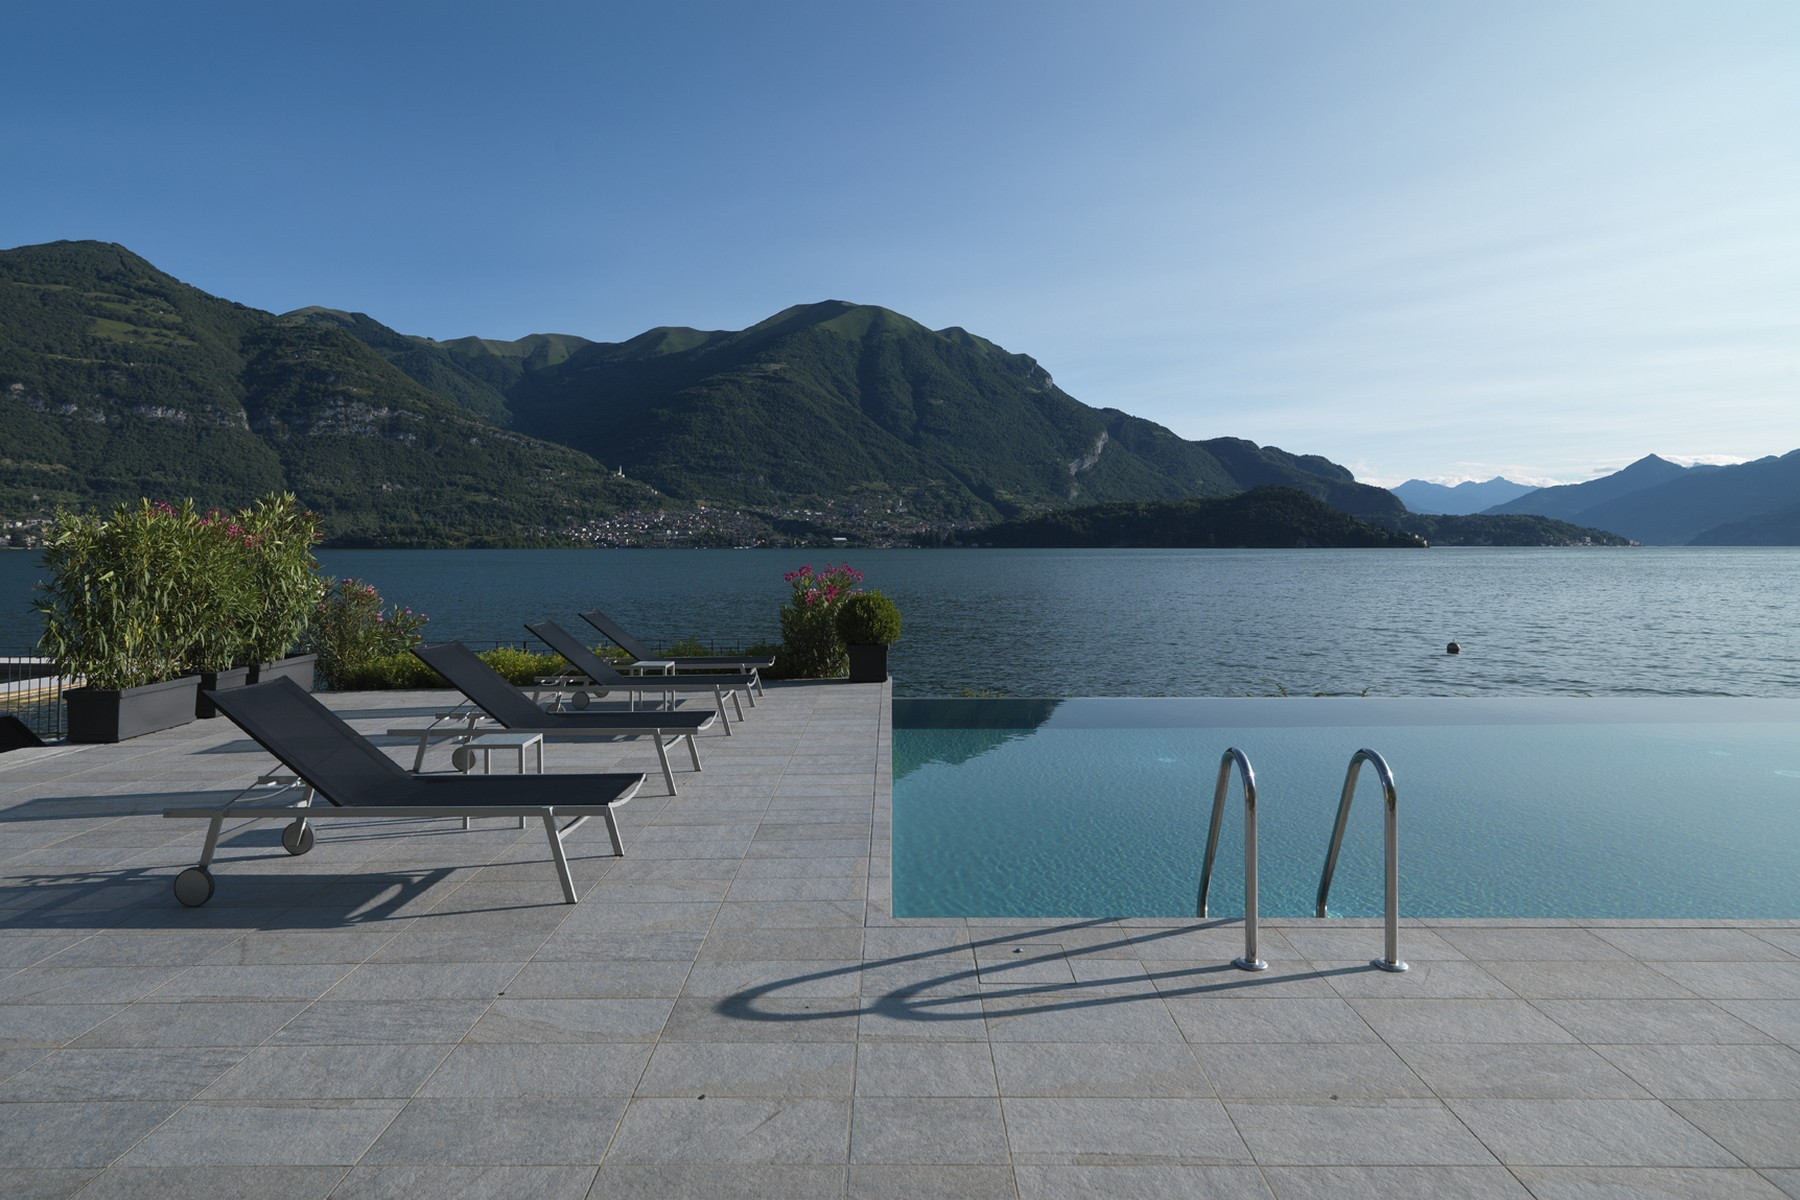 Single Family Home for Sale at Splendid semi-independent villa directly on the lake Località Bagnana Lezzeno, Como 22025 Italy